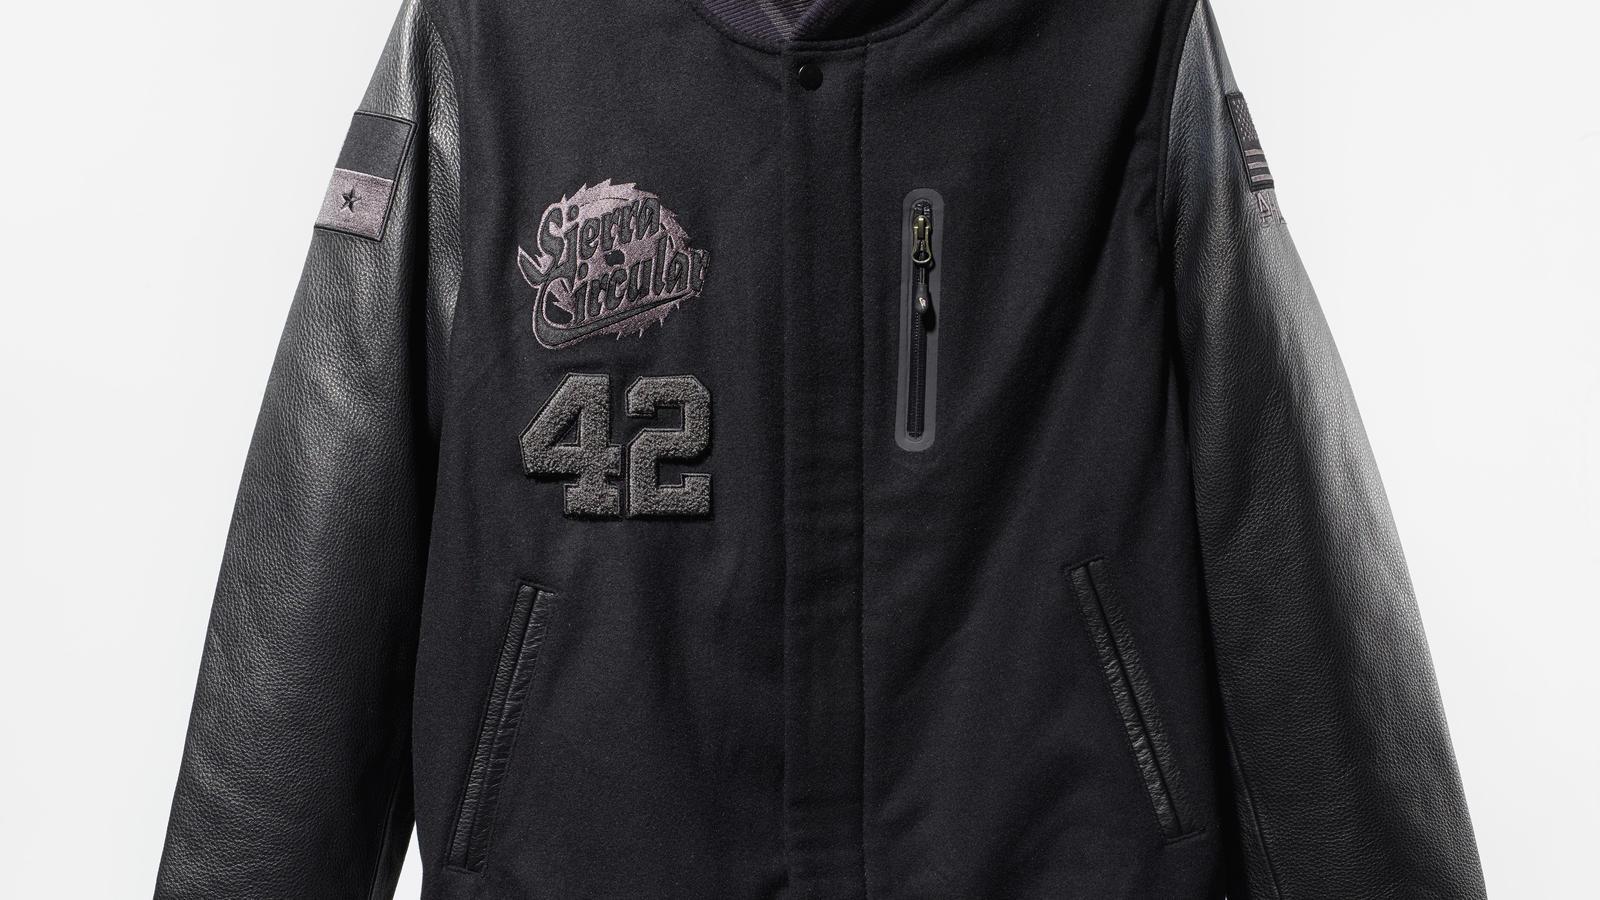 nike_sierra_circular_jacket_front